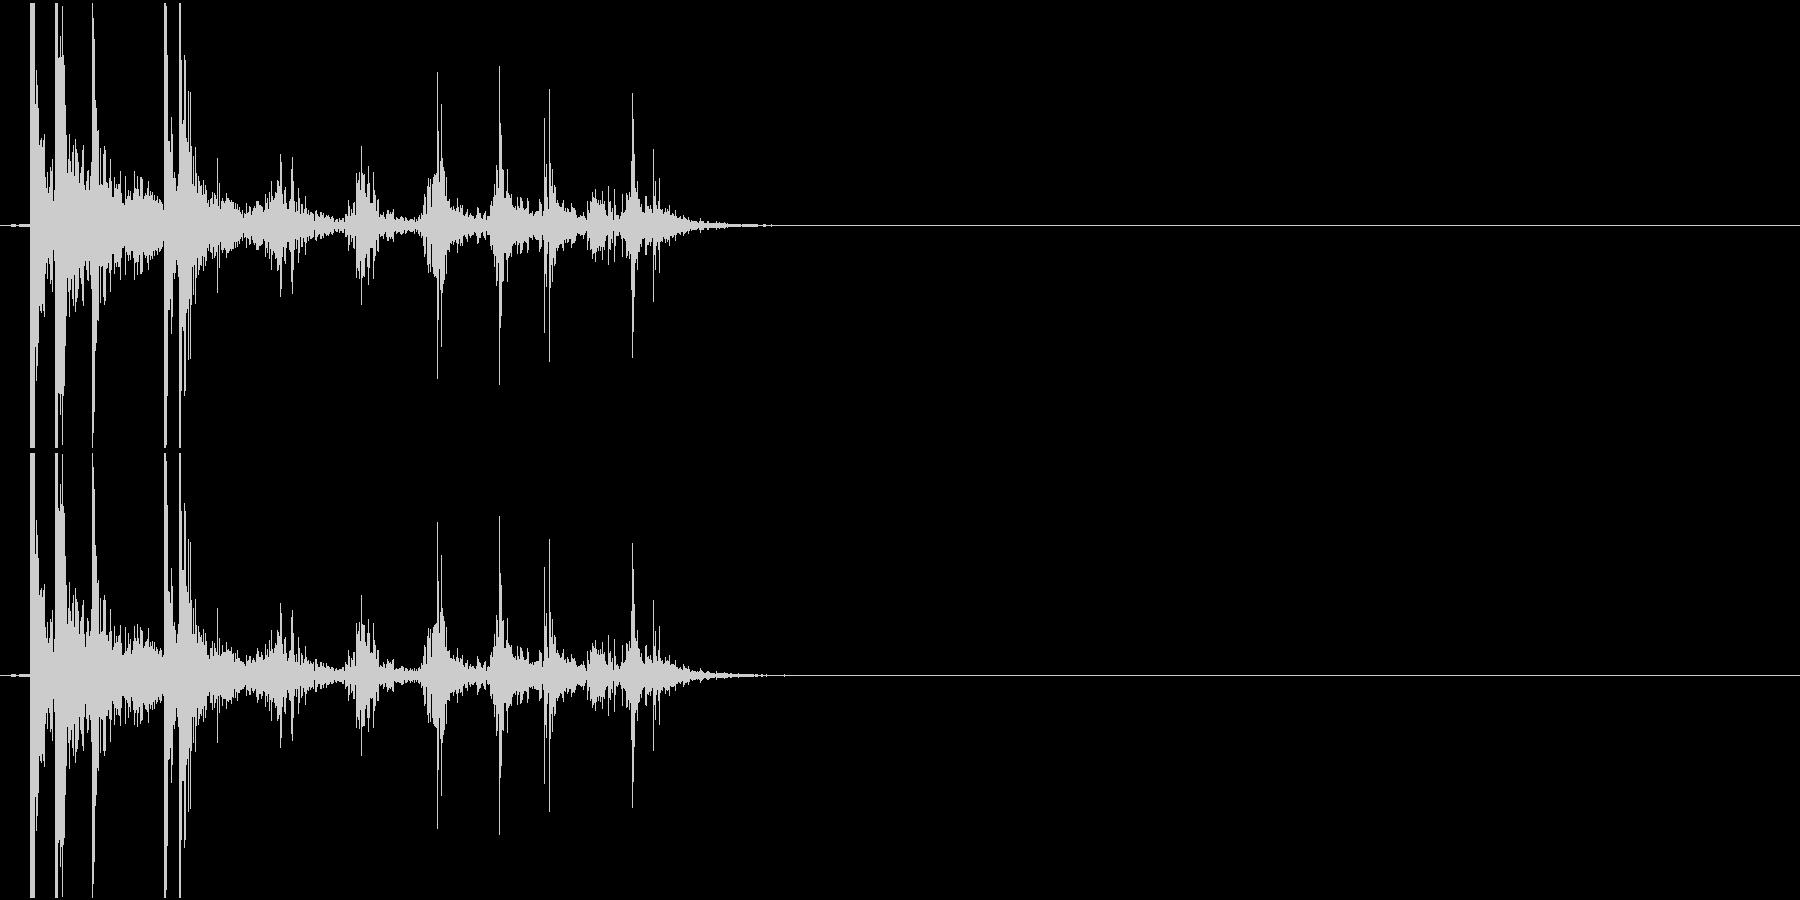 Coin 硬貨を投げ置く音 チップの未再生の波形